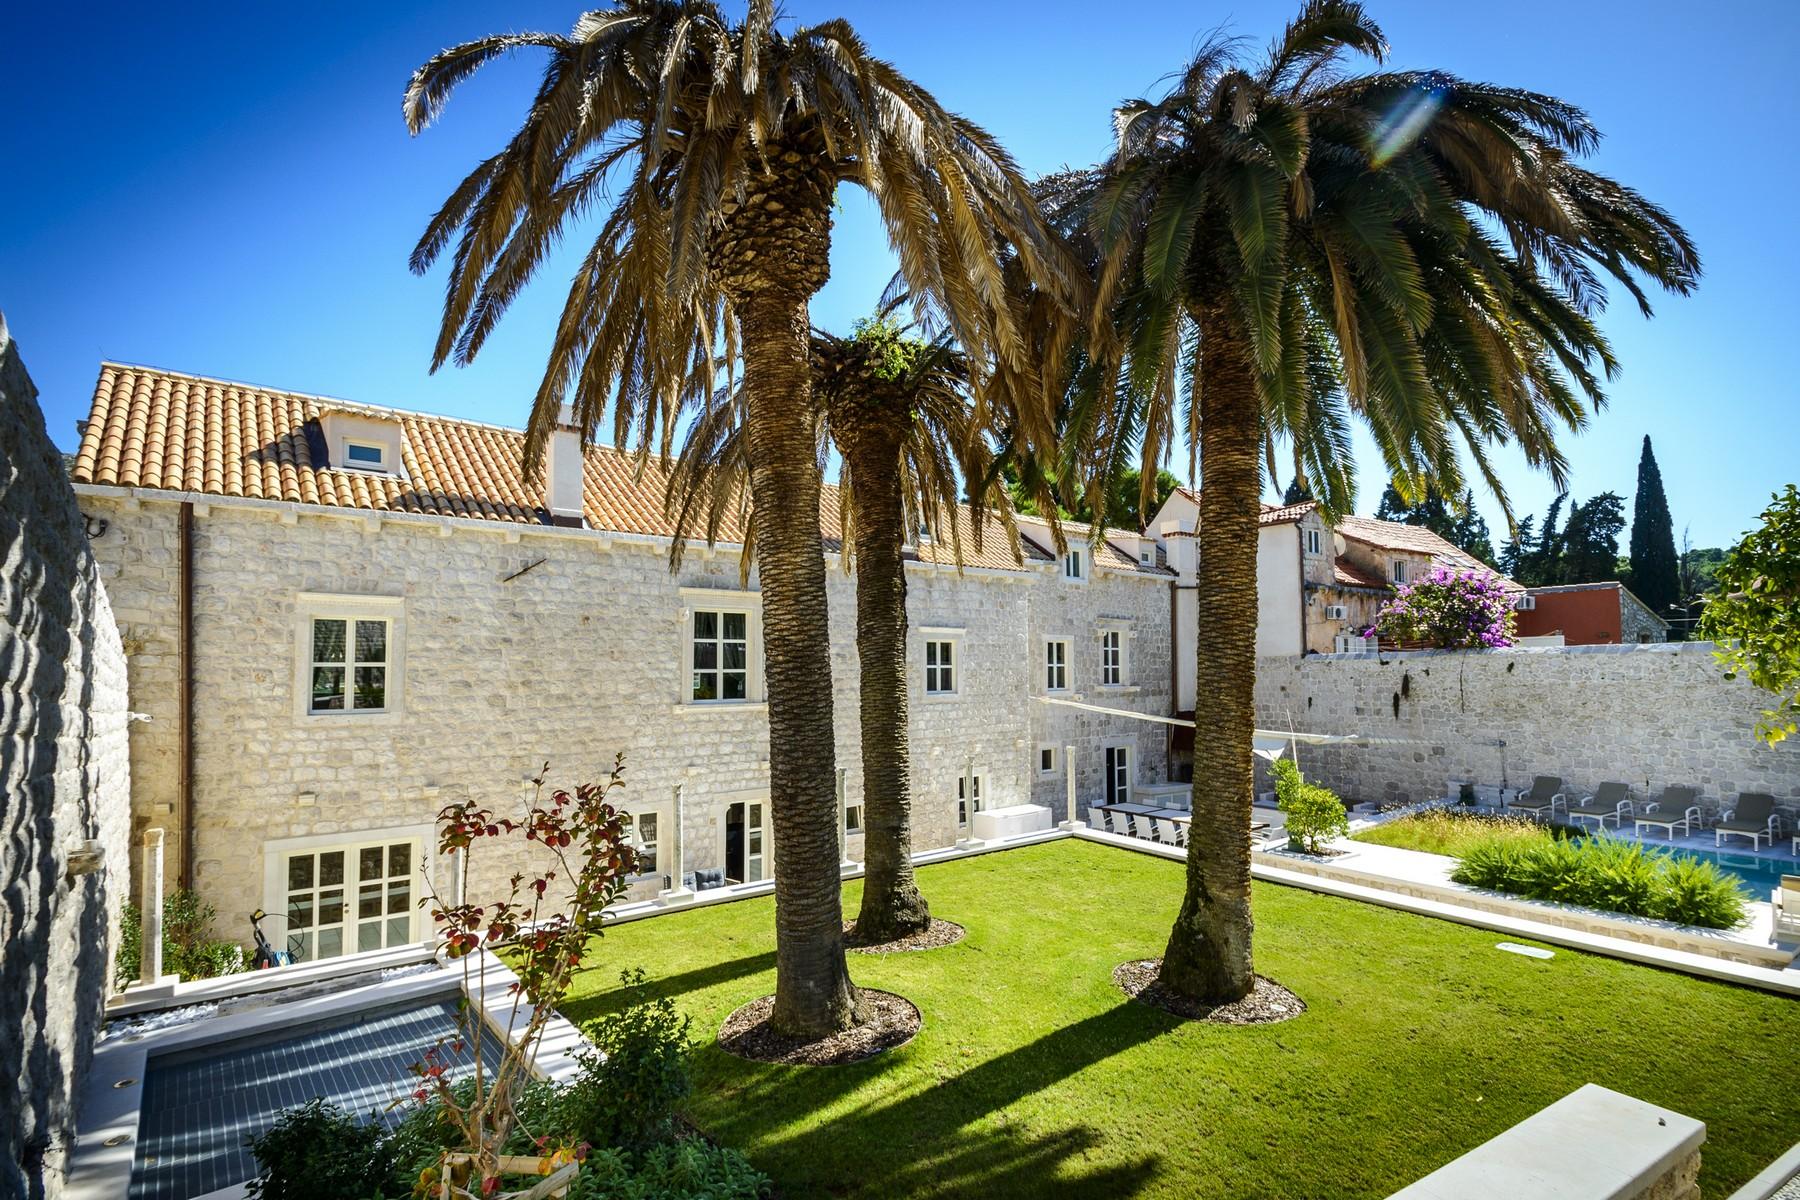 Single Family Homes for Sale at Admiral Residence Zaton Dubrovnik, Dubrovnik Neretva 20000 Croatia